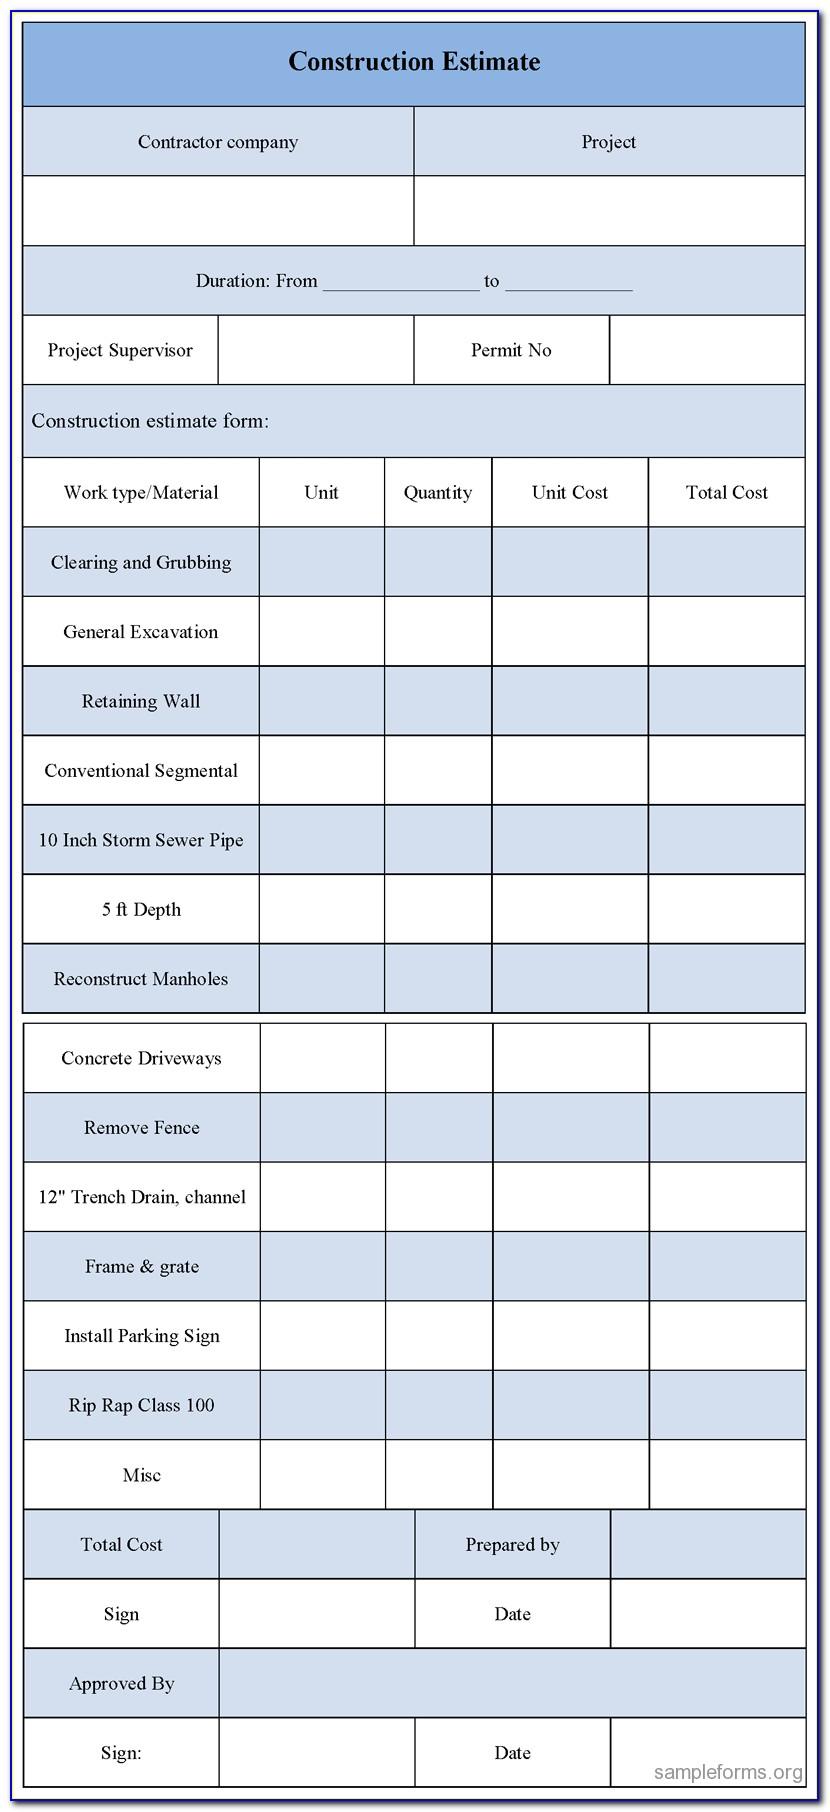 Sample Construction Estimate Form